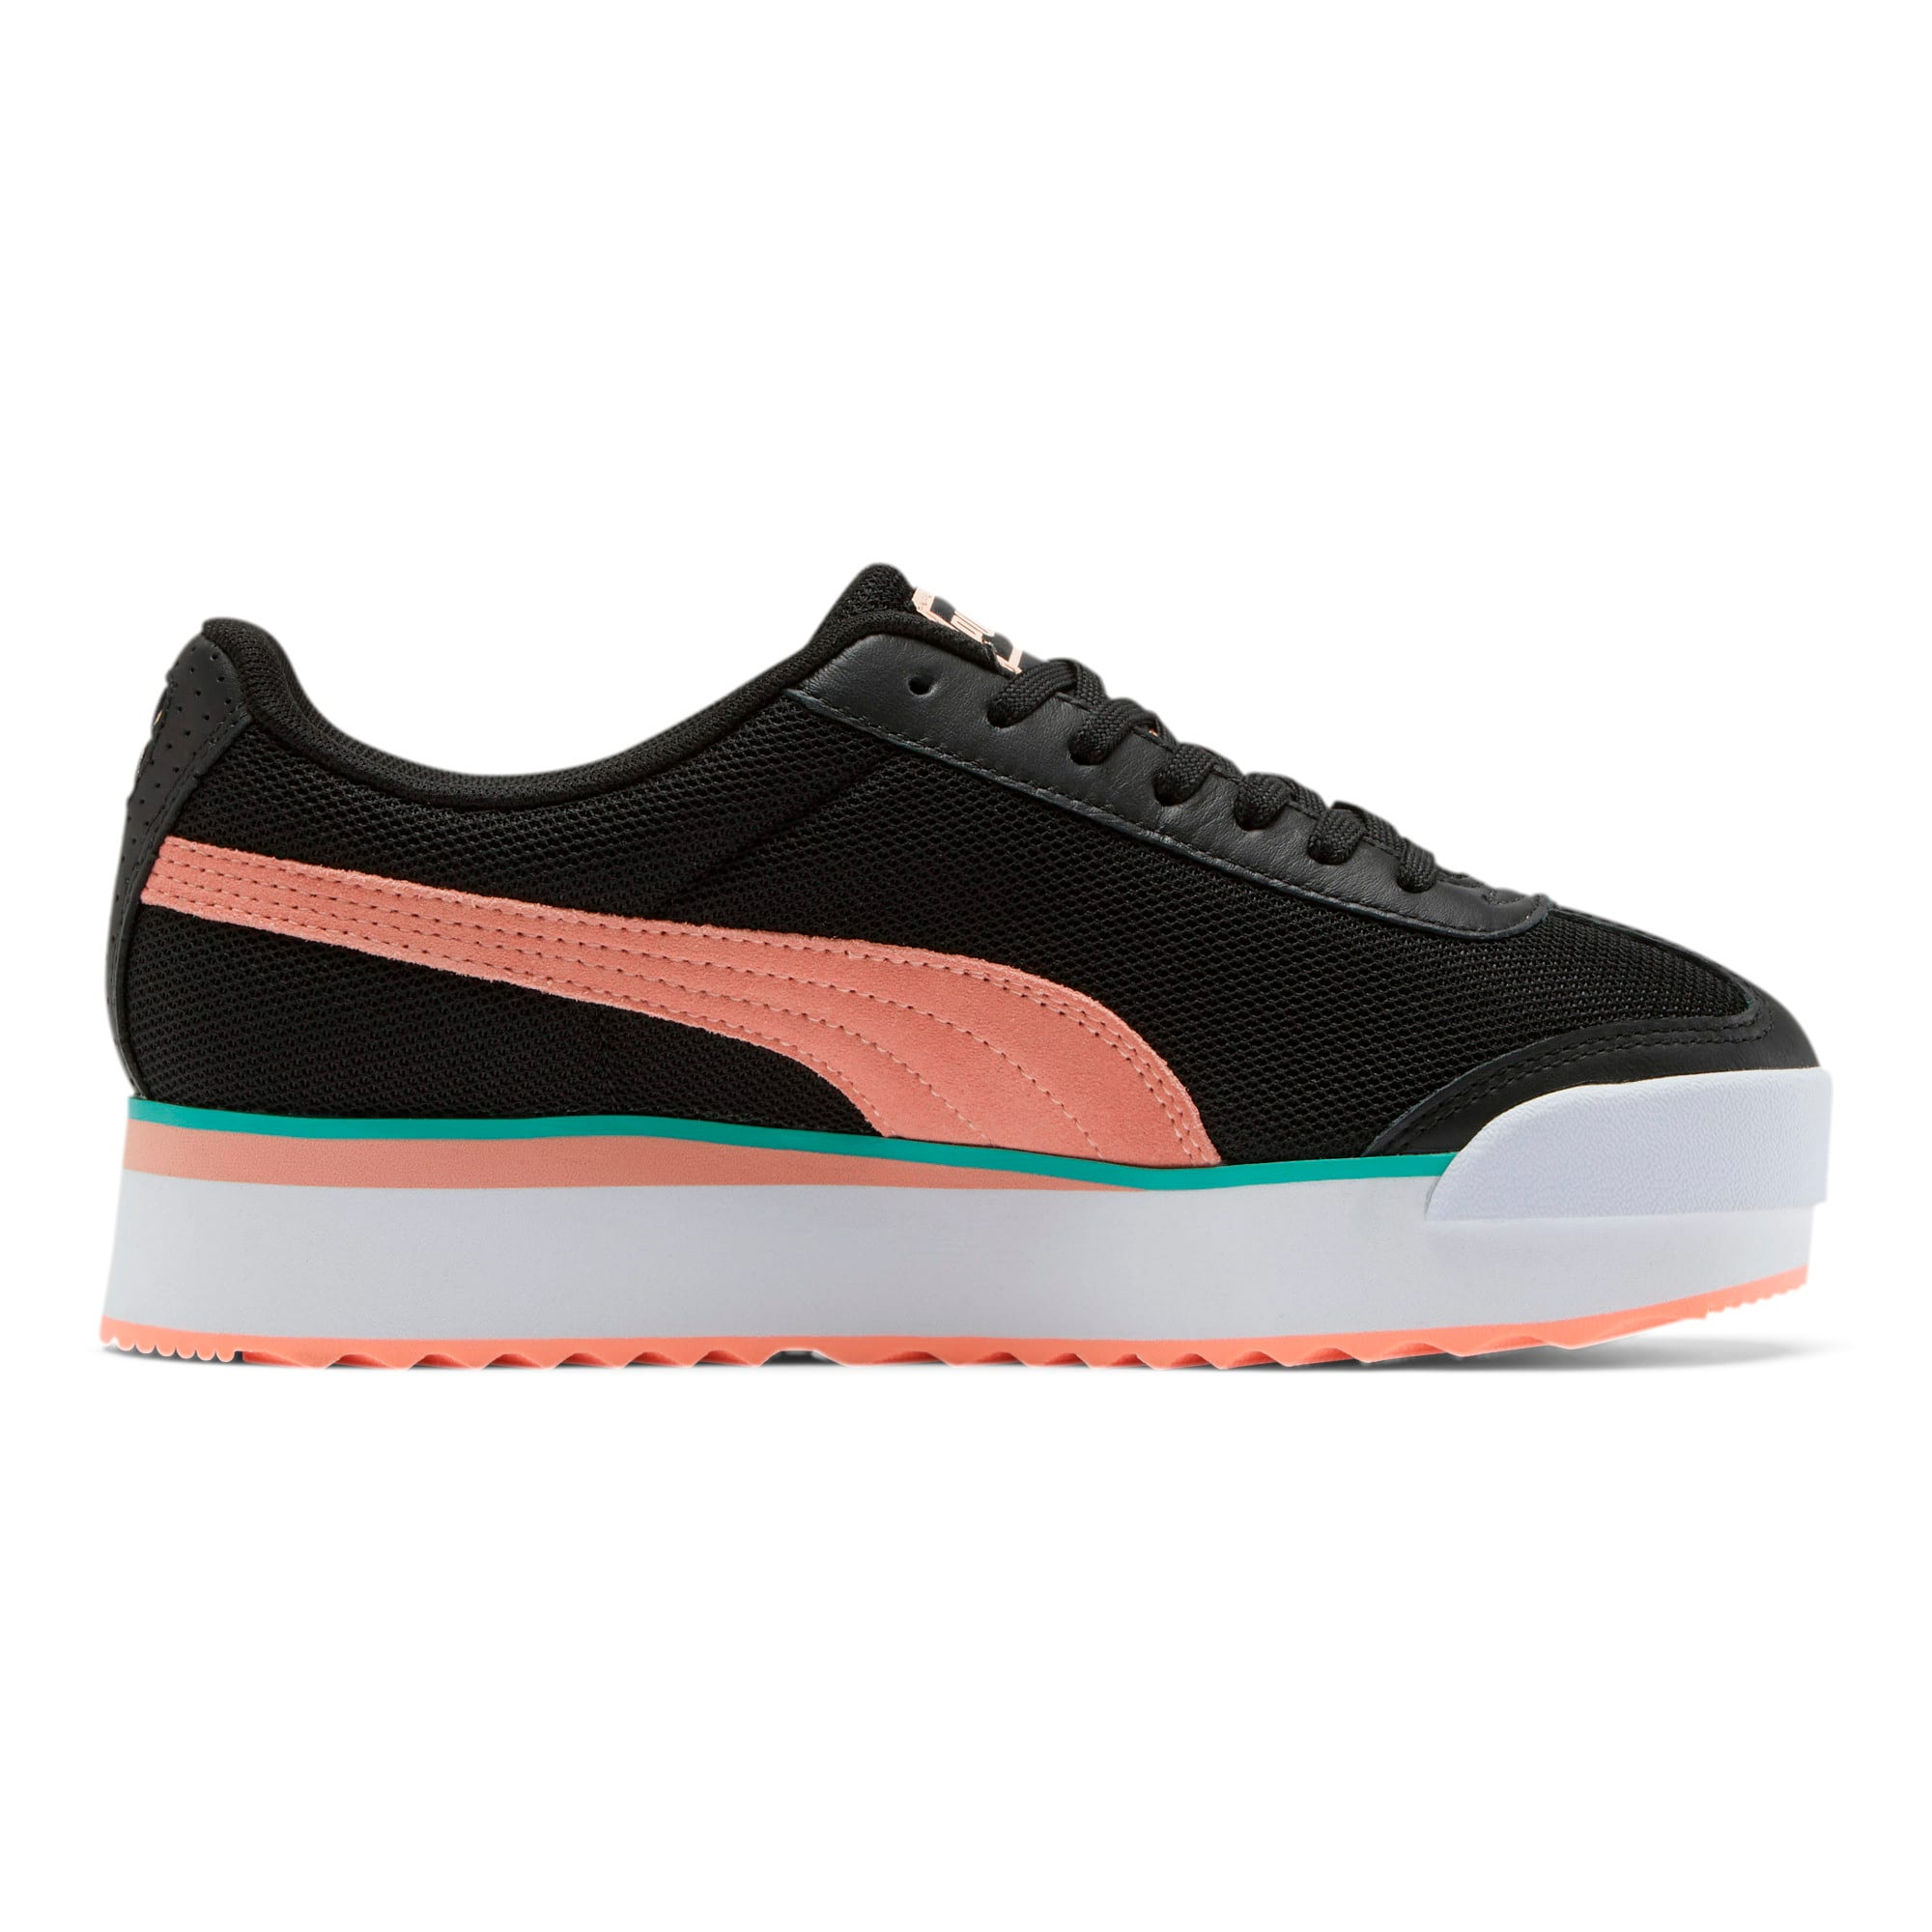 Zapatos deportivos Roma Amor Mesh Mix para mujer